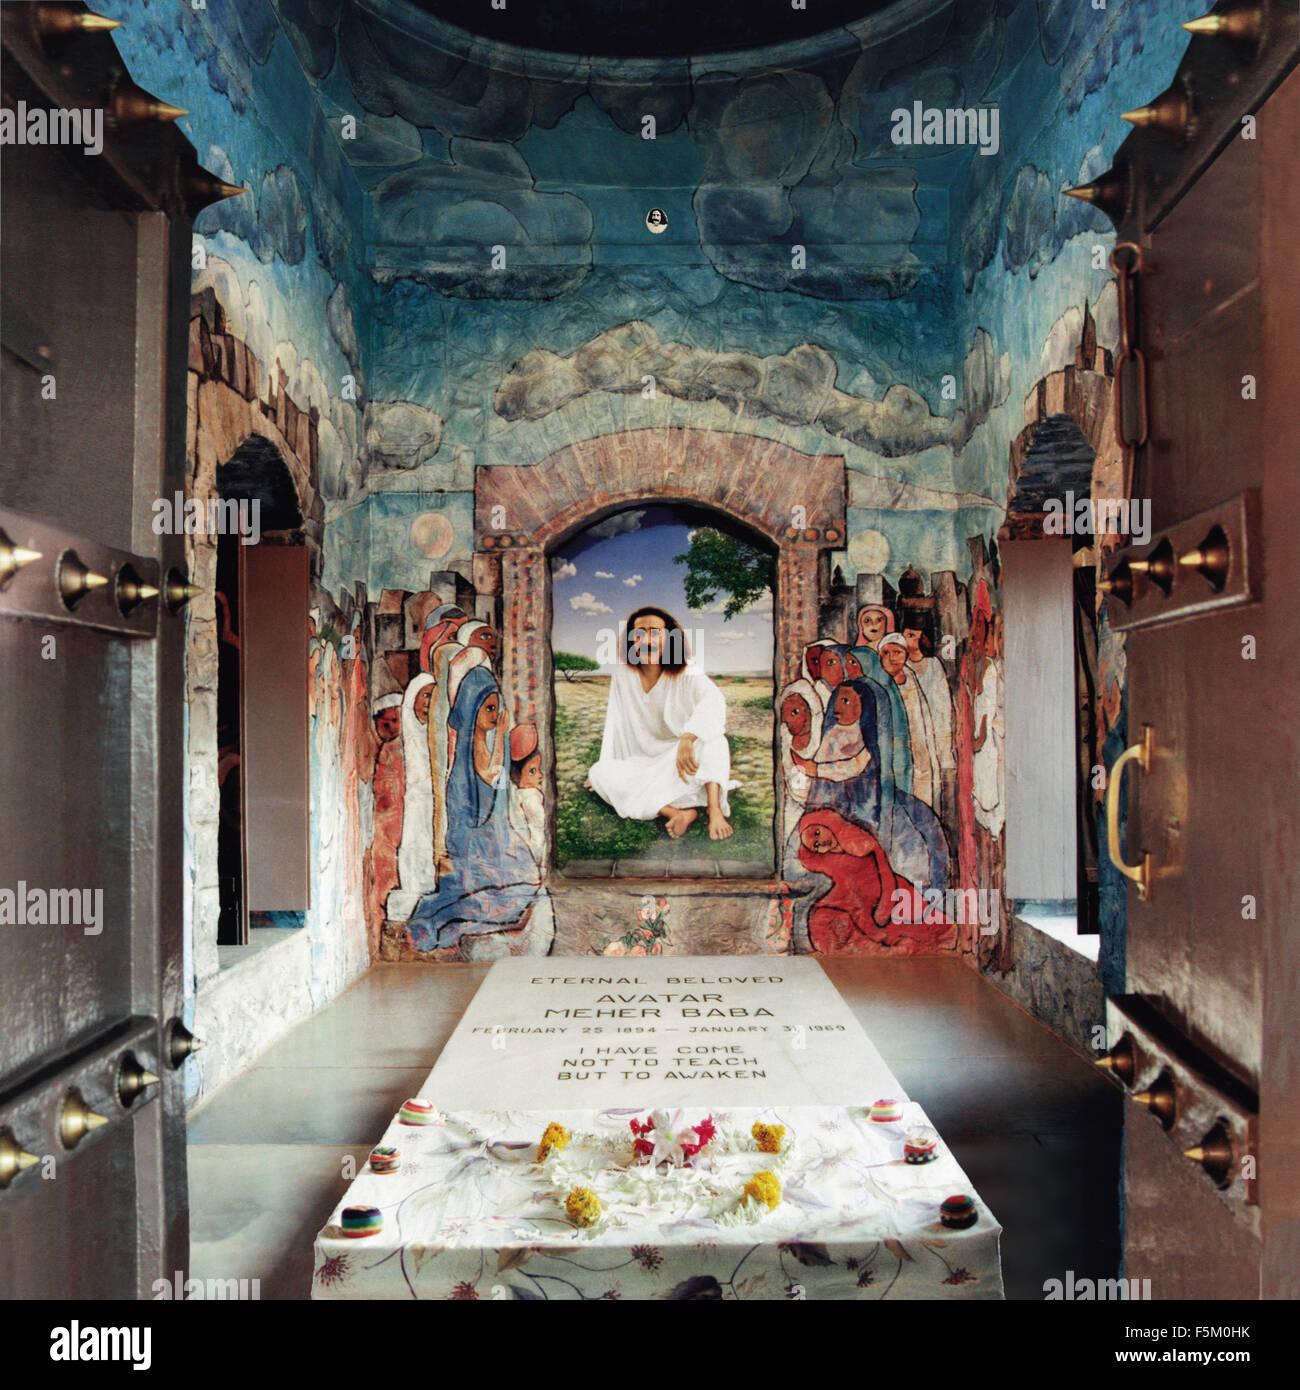 Avatar meher baba cimitero, India, Asia Immagini Stock